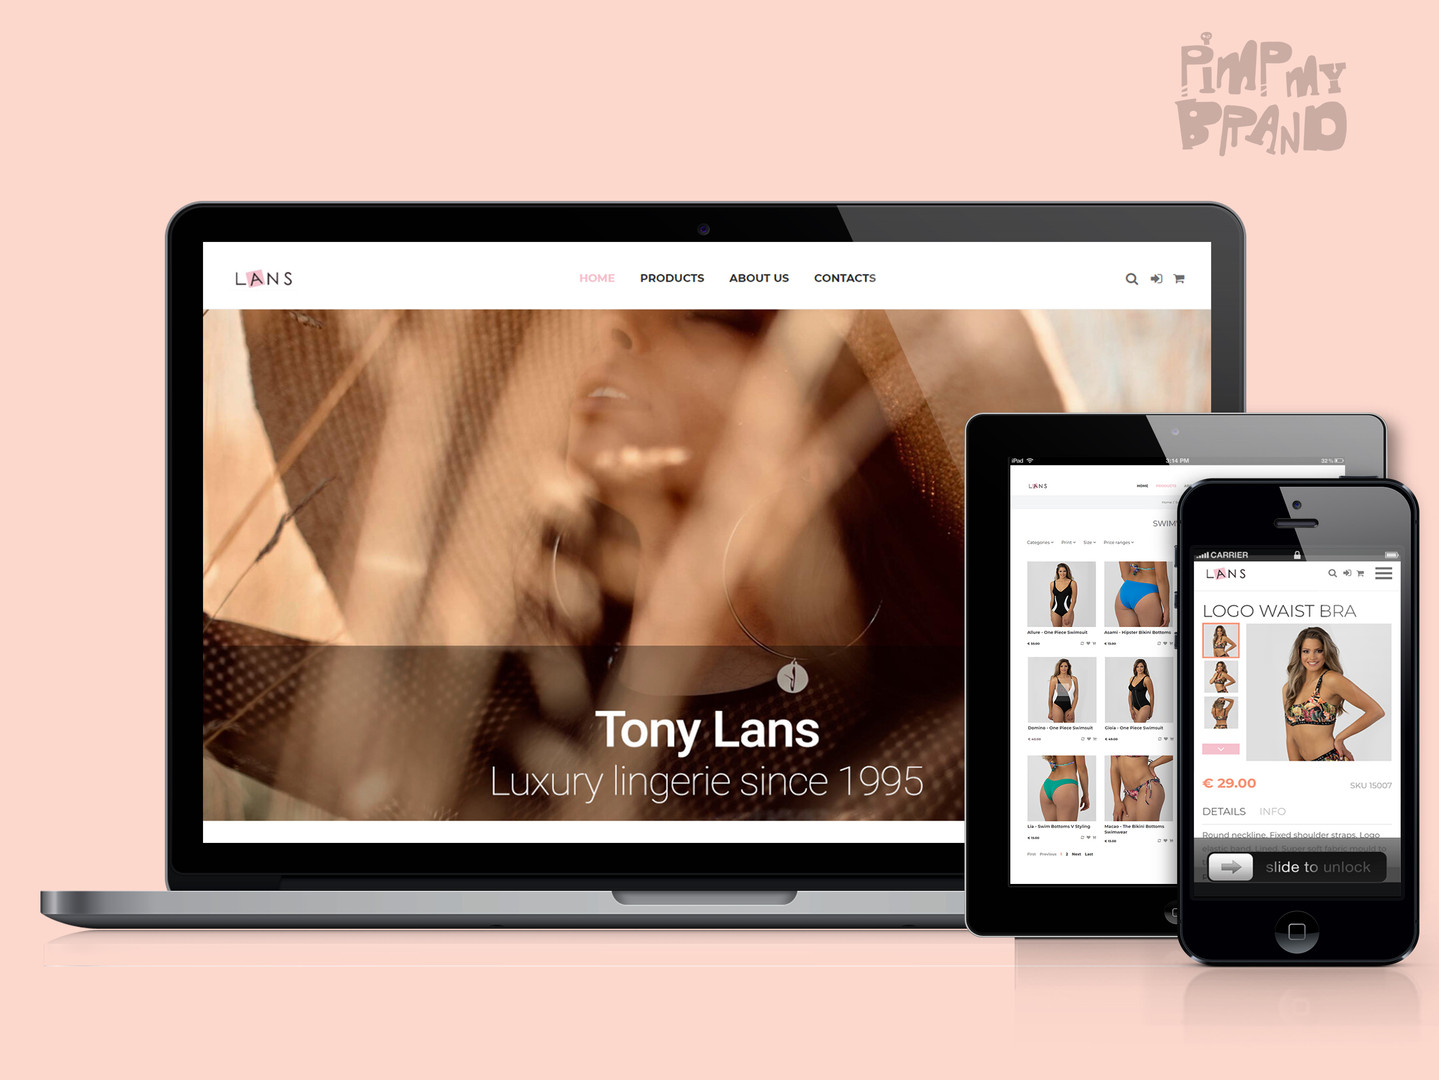 Tony Lans Store Website Design